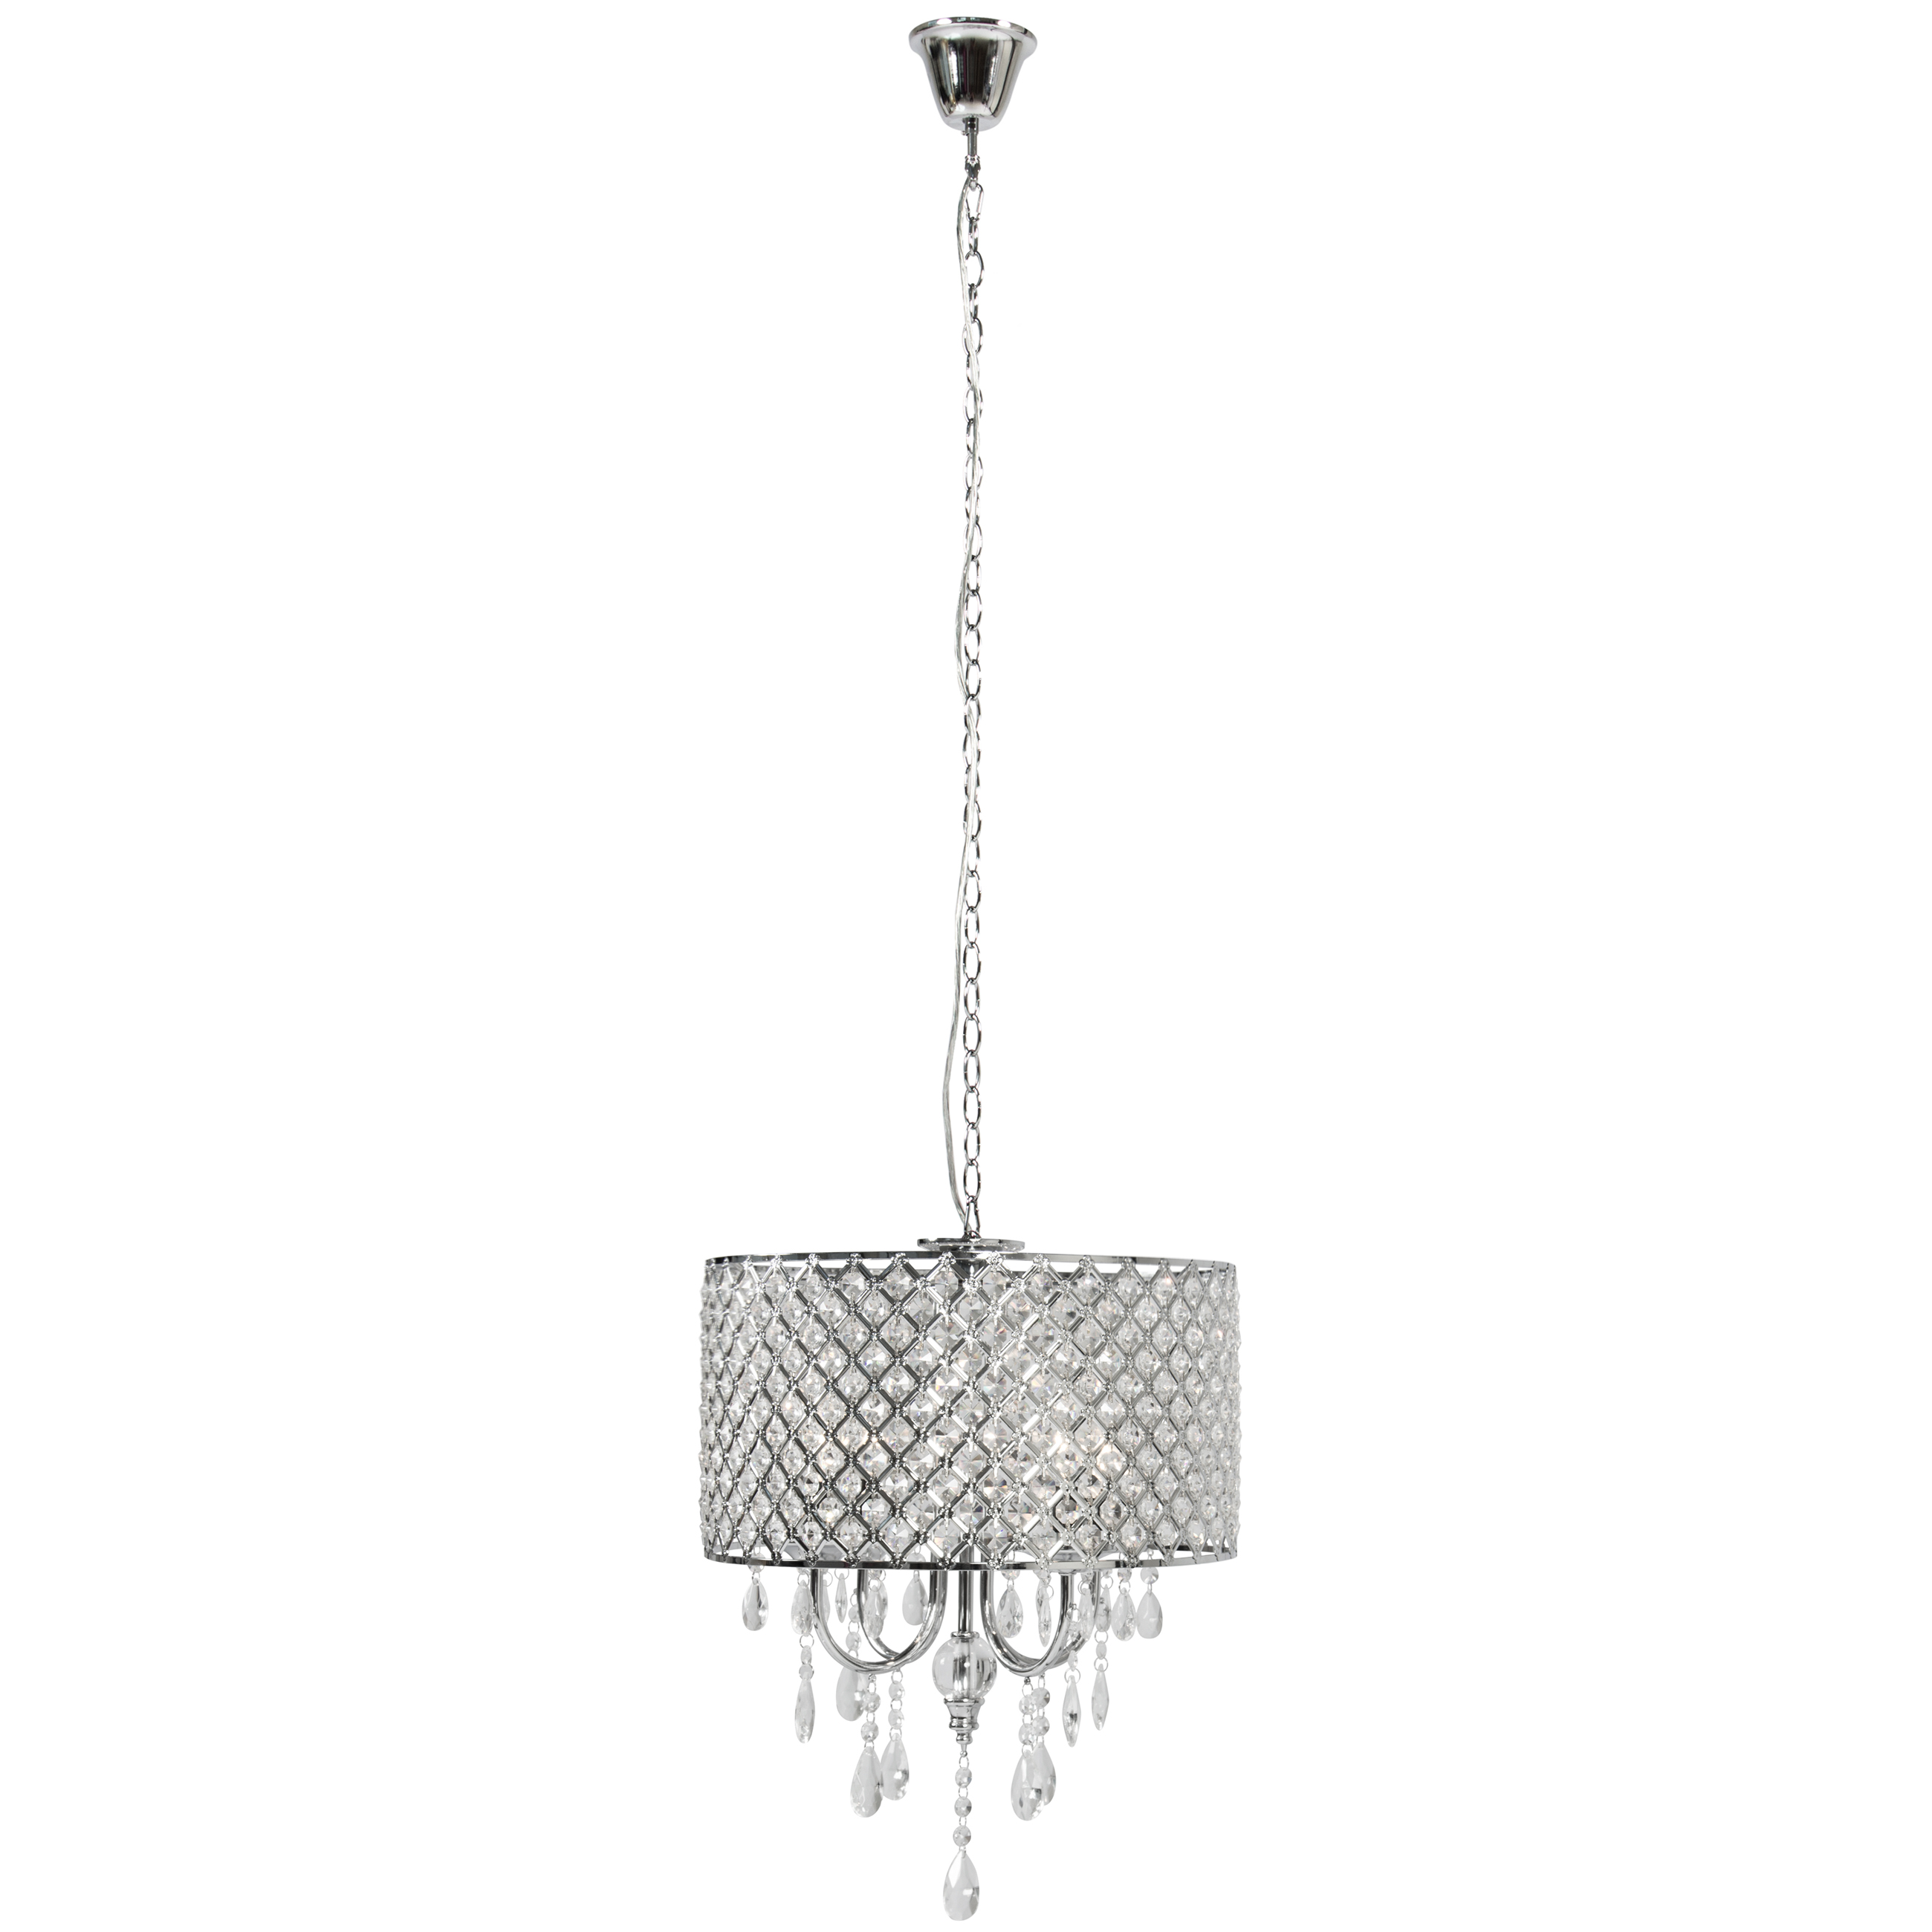 Best Choice S Bcp Crystal Chandelier Lighting Pendant Glass Ceiling Lamp Center Light Com